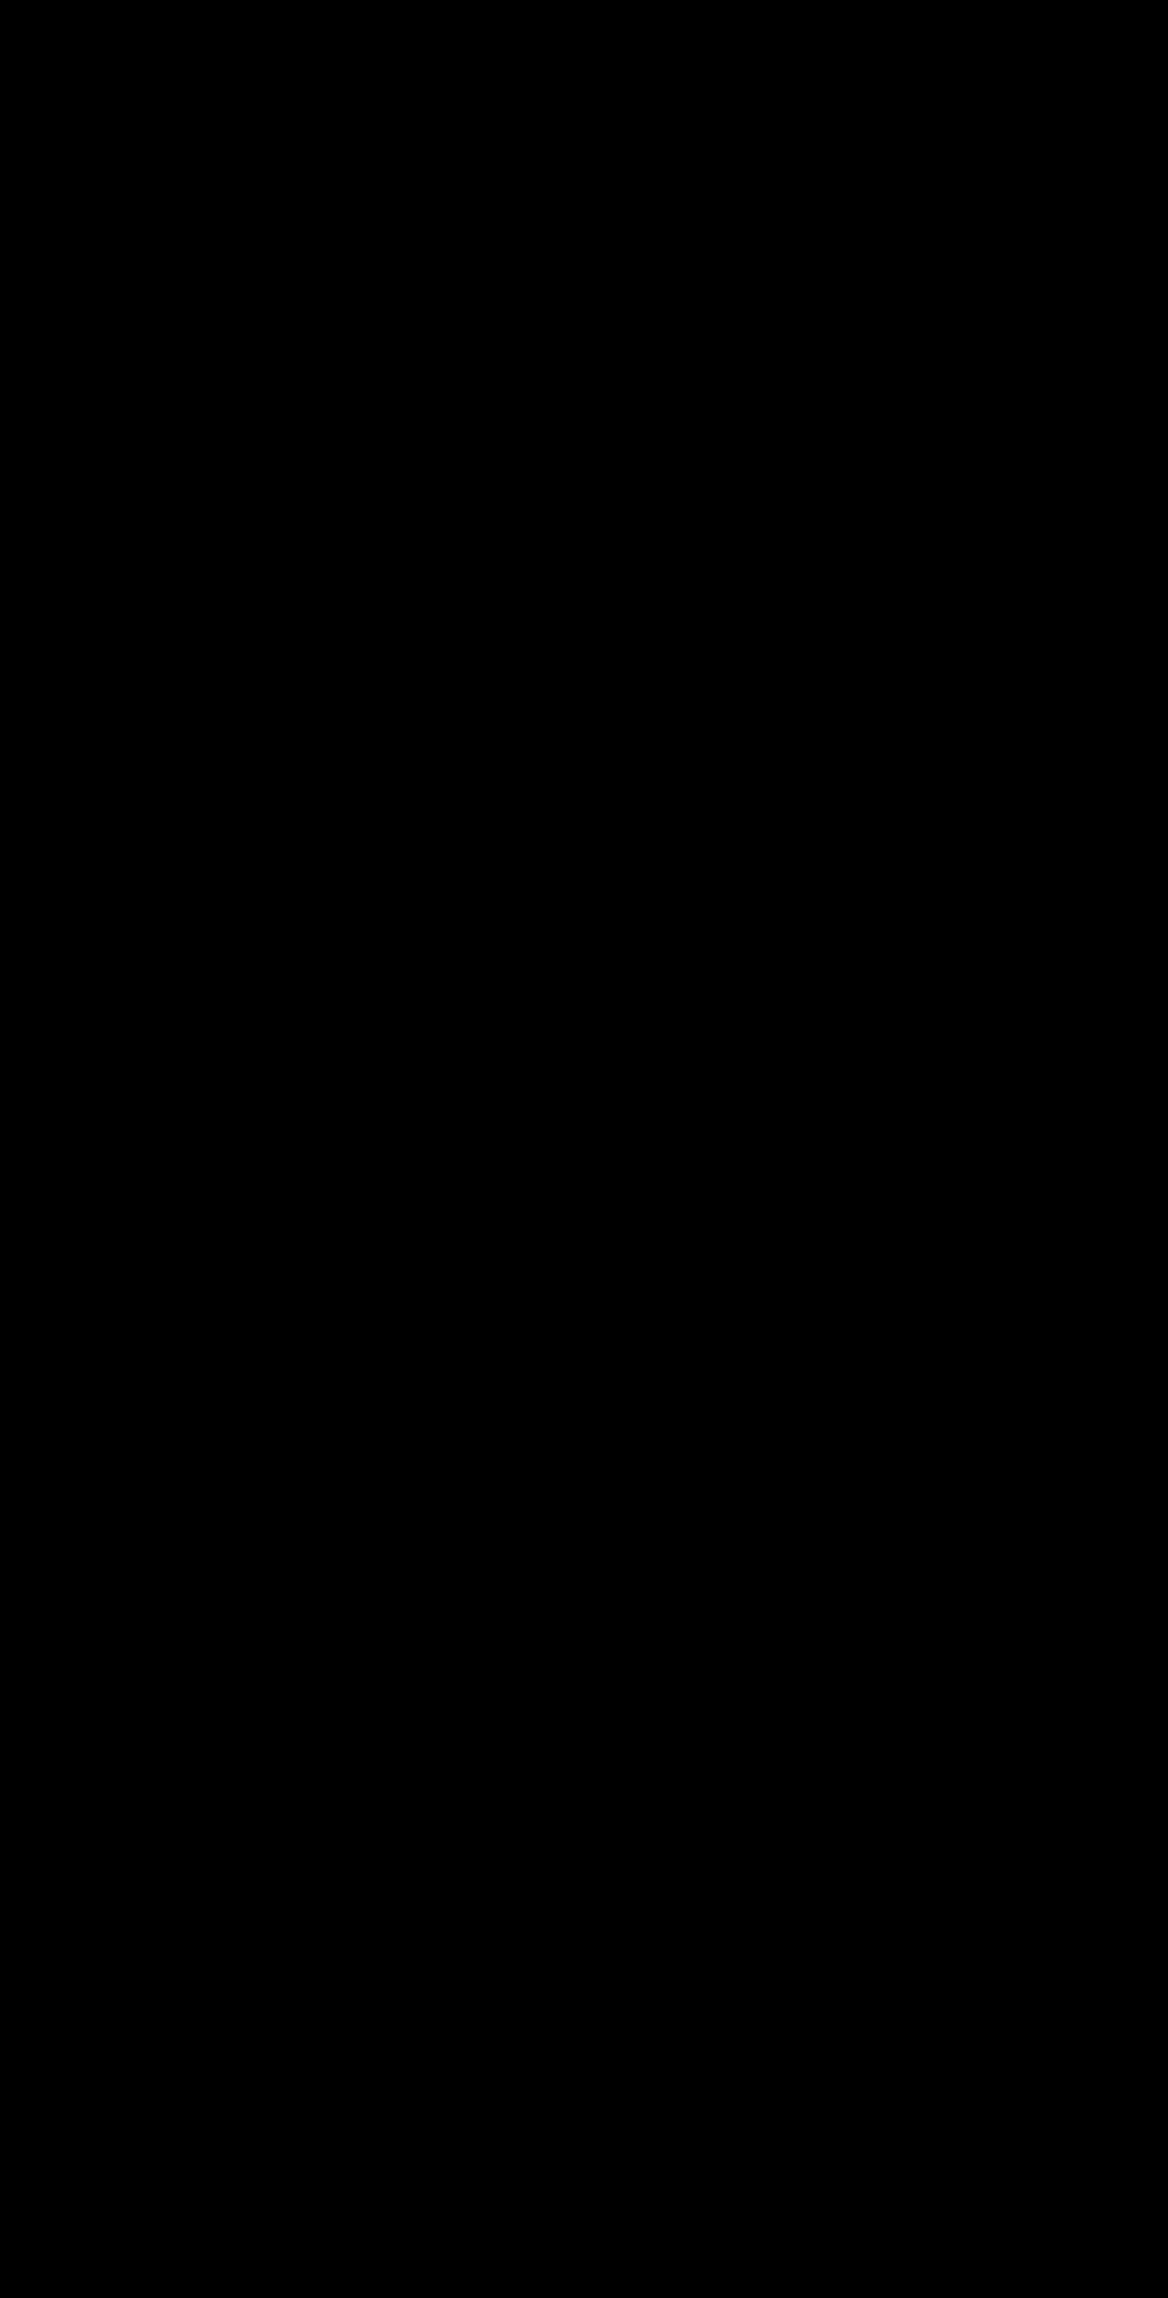 Heron silhouette big image. Crane clipart animal